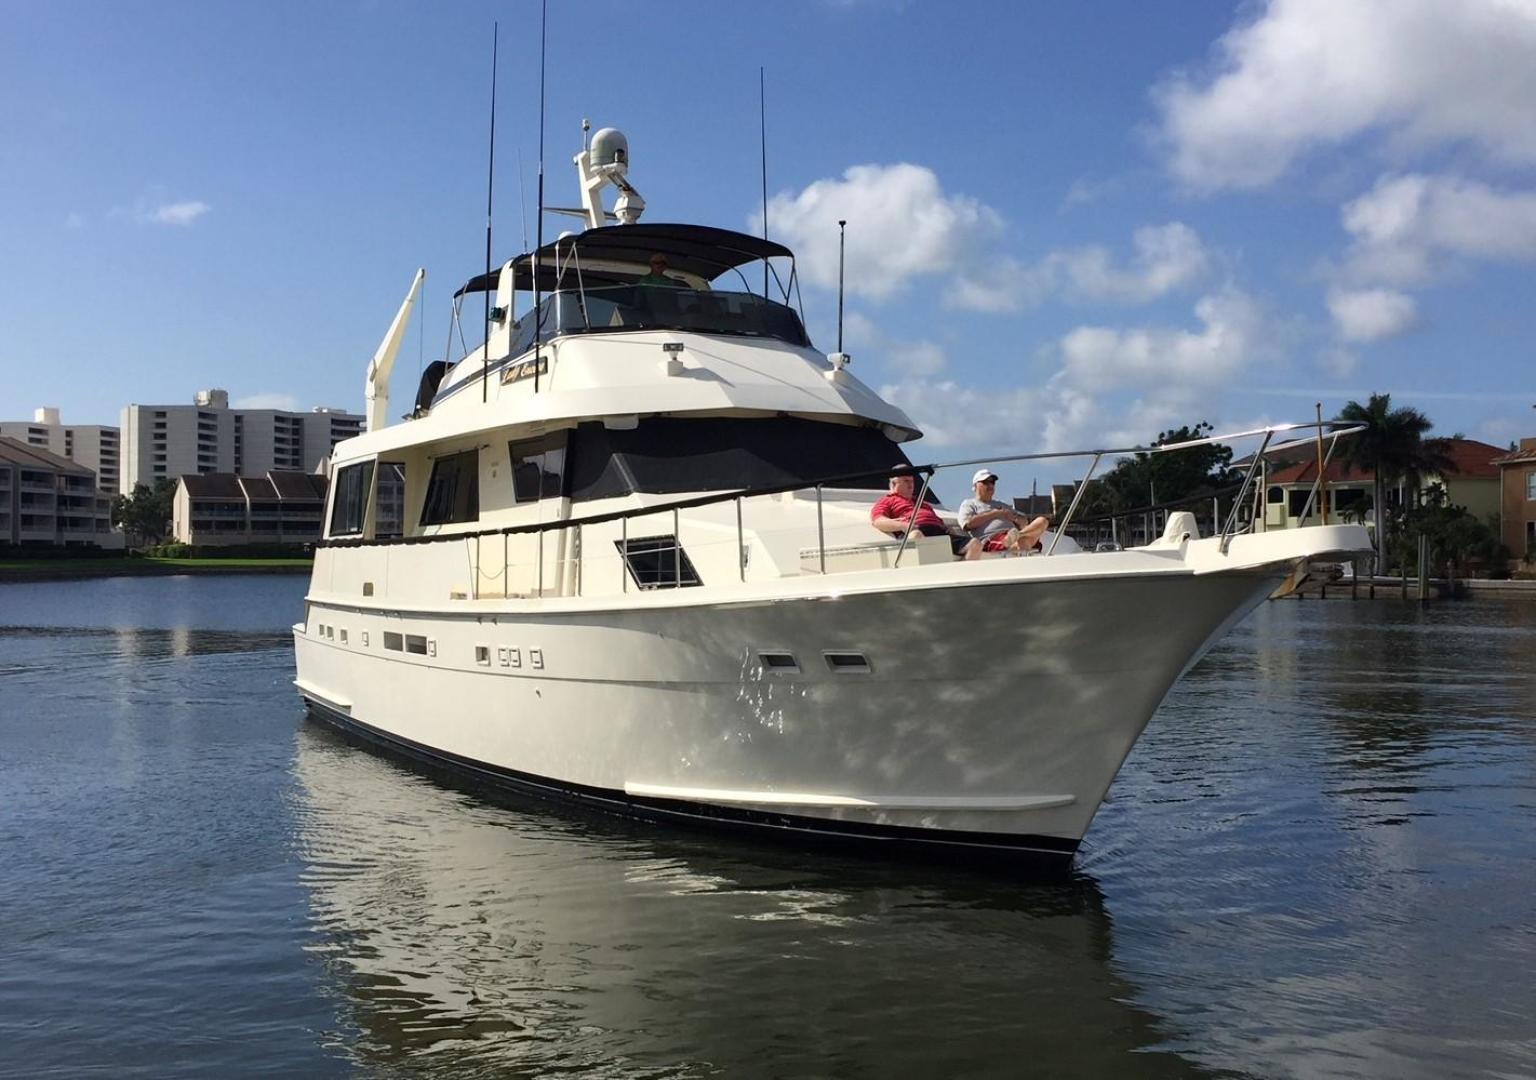 Hatteras-67-Cockpit-Motor-Yacht-1988-Lady-Encore-Saint-Petersburg-Florida-United-States-Bow-Profile-926168